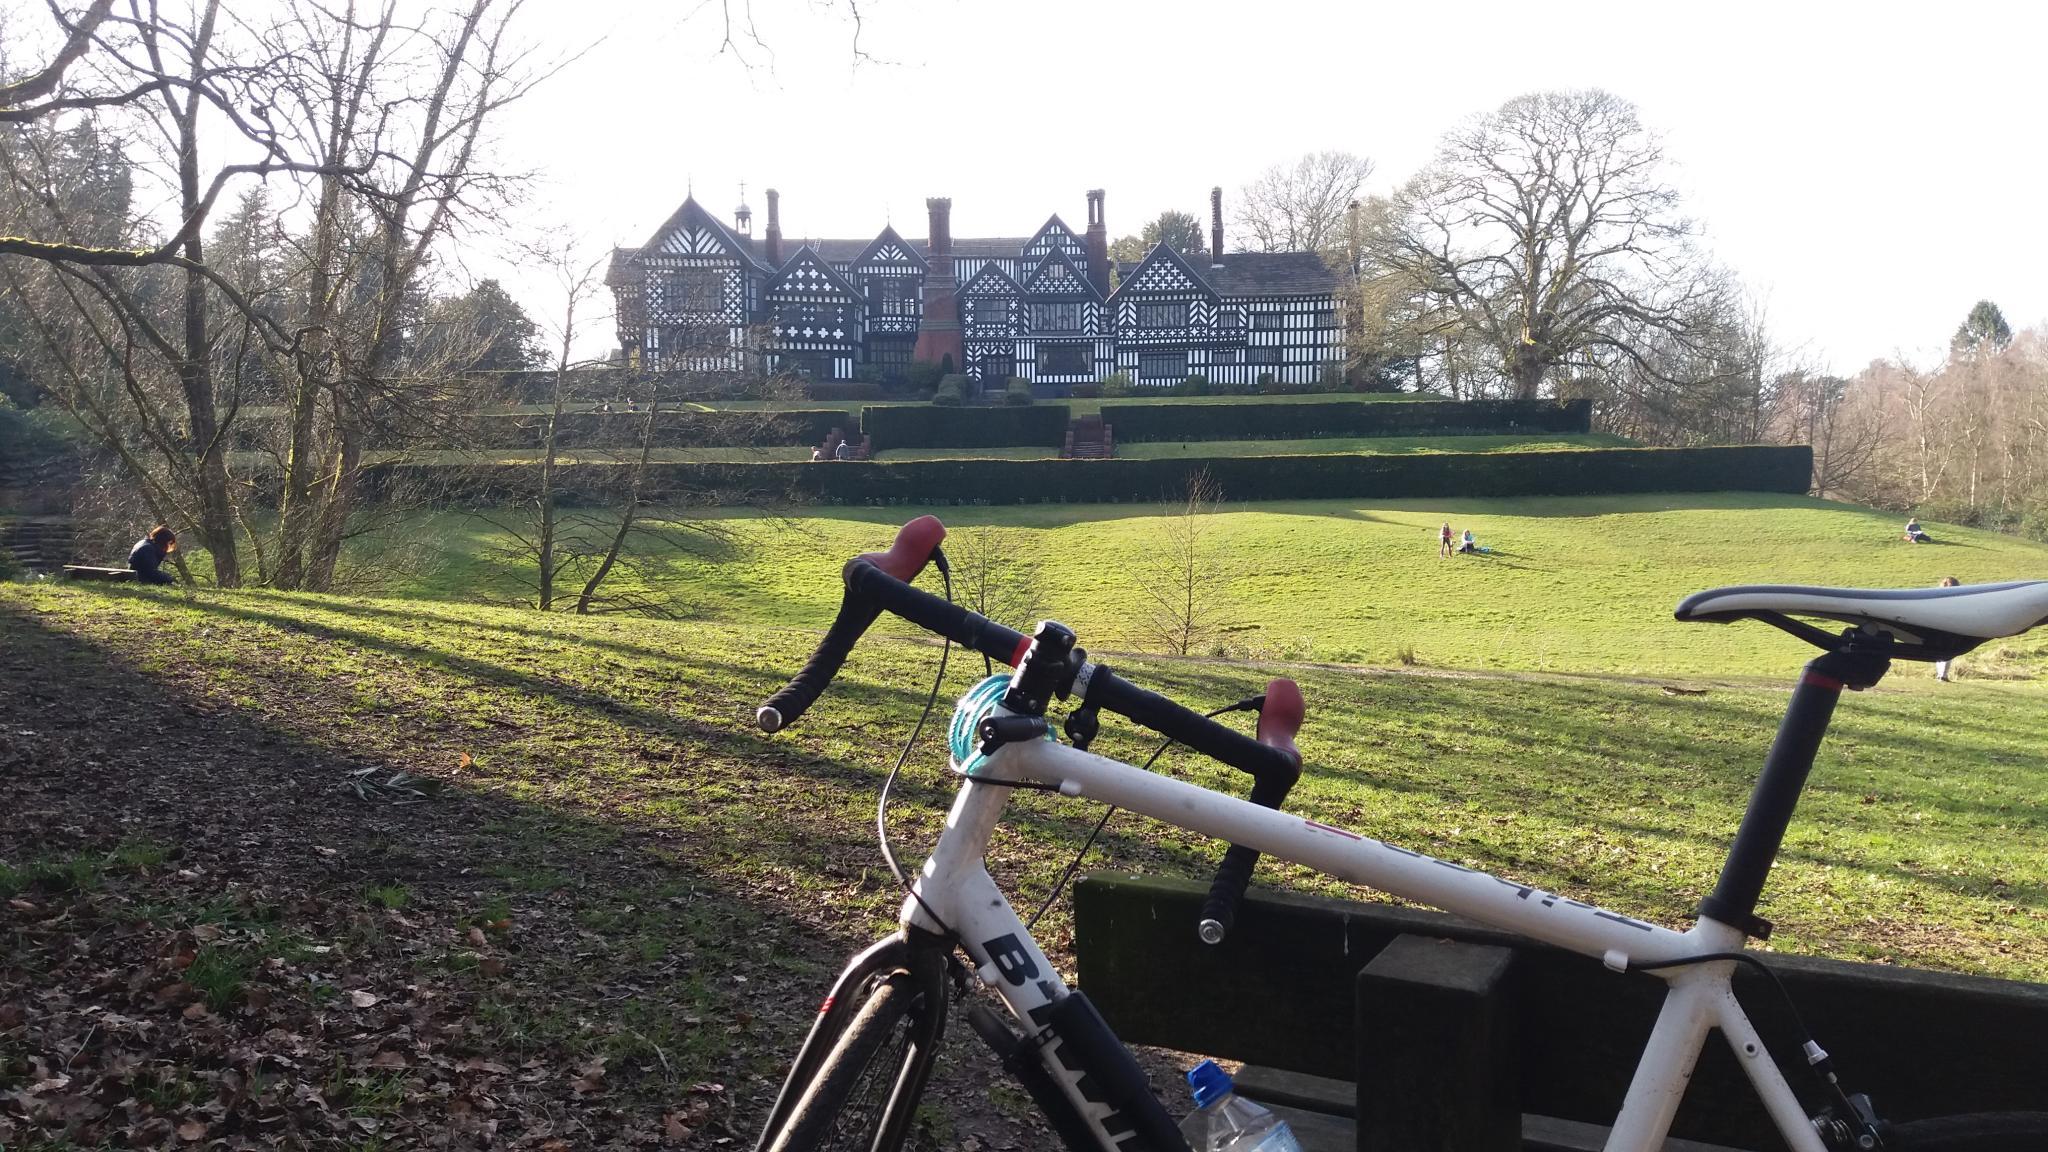 On my bike-20200322_154430-jpg